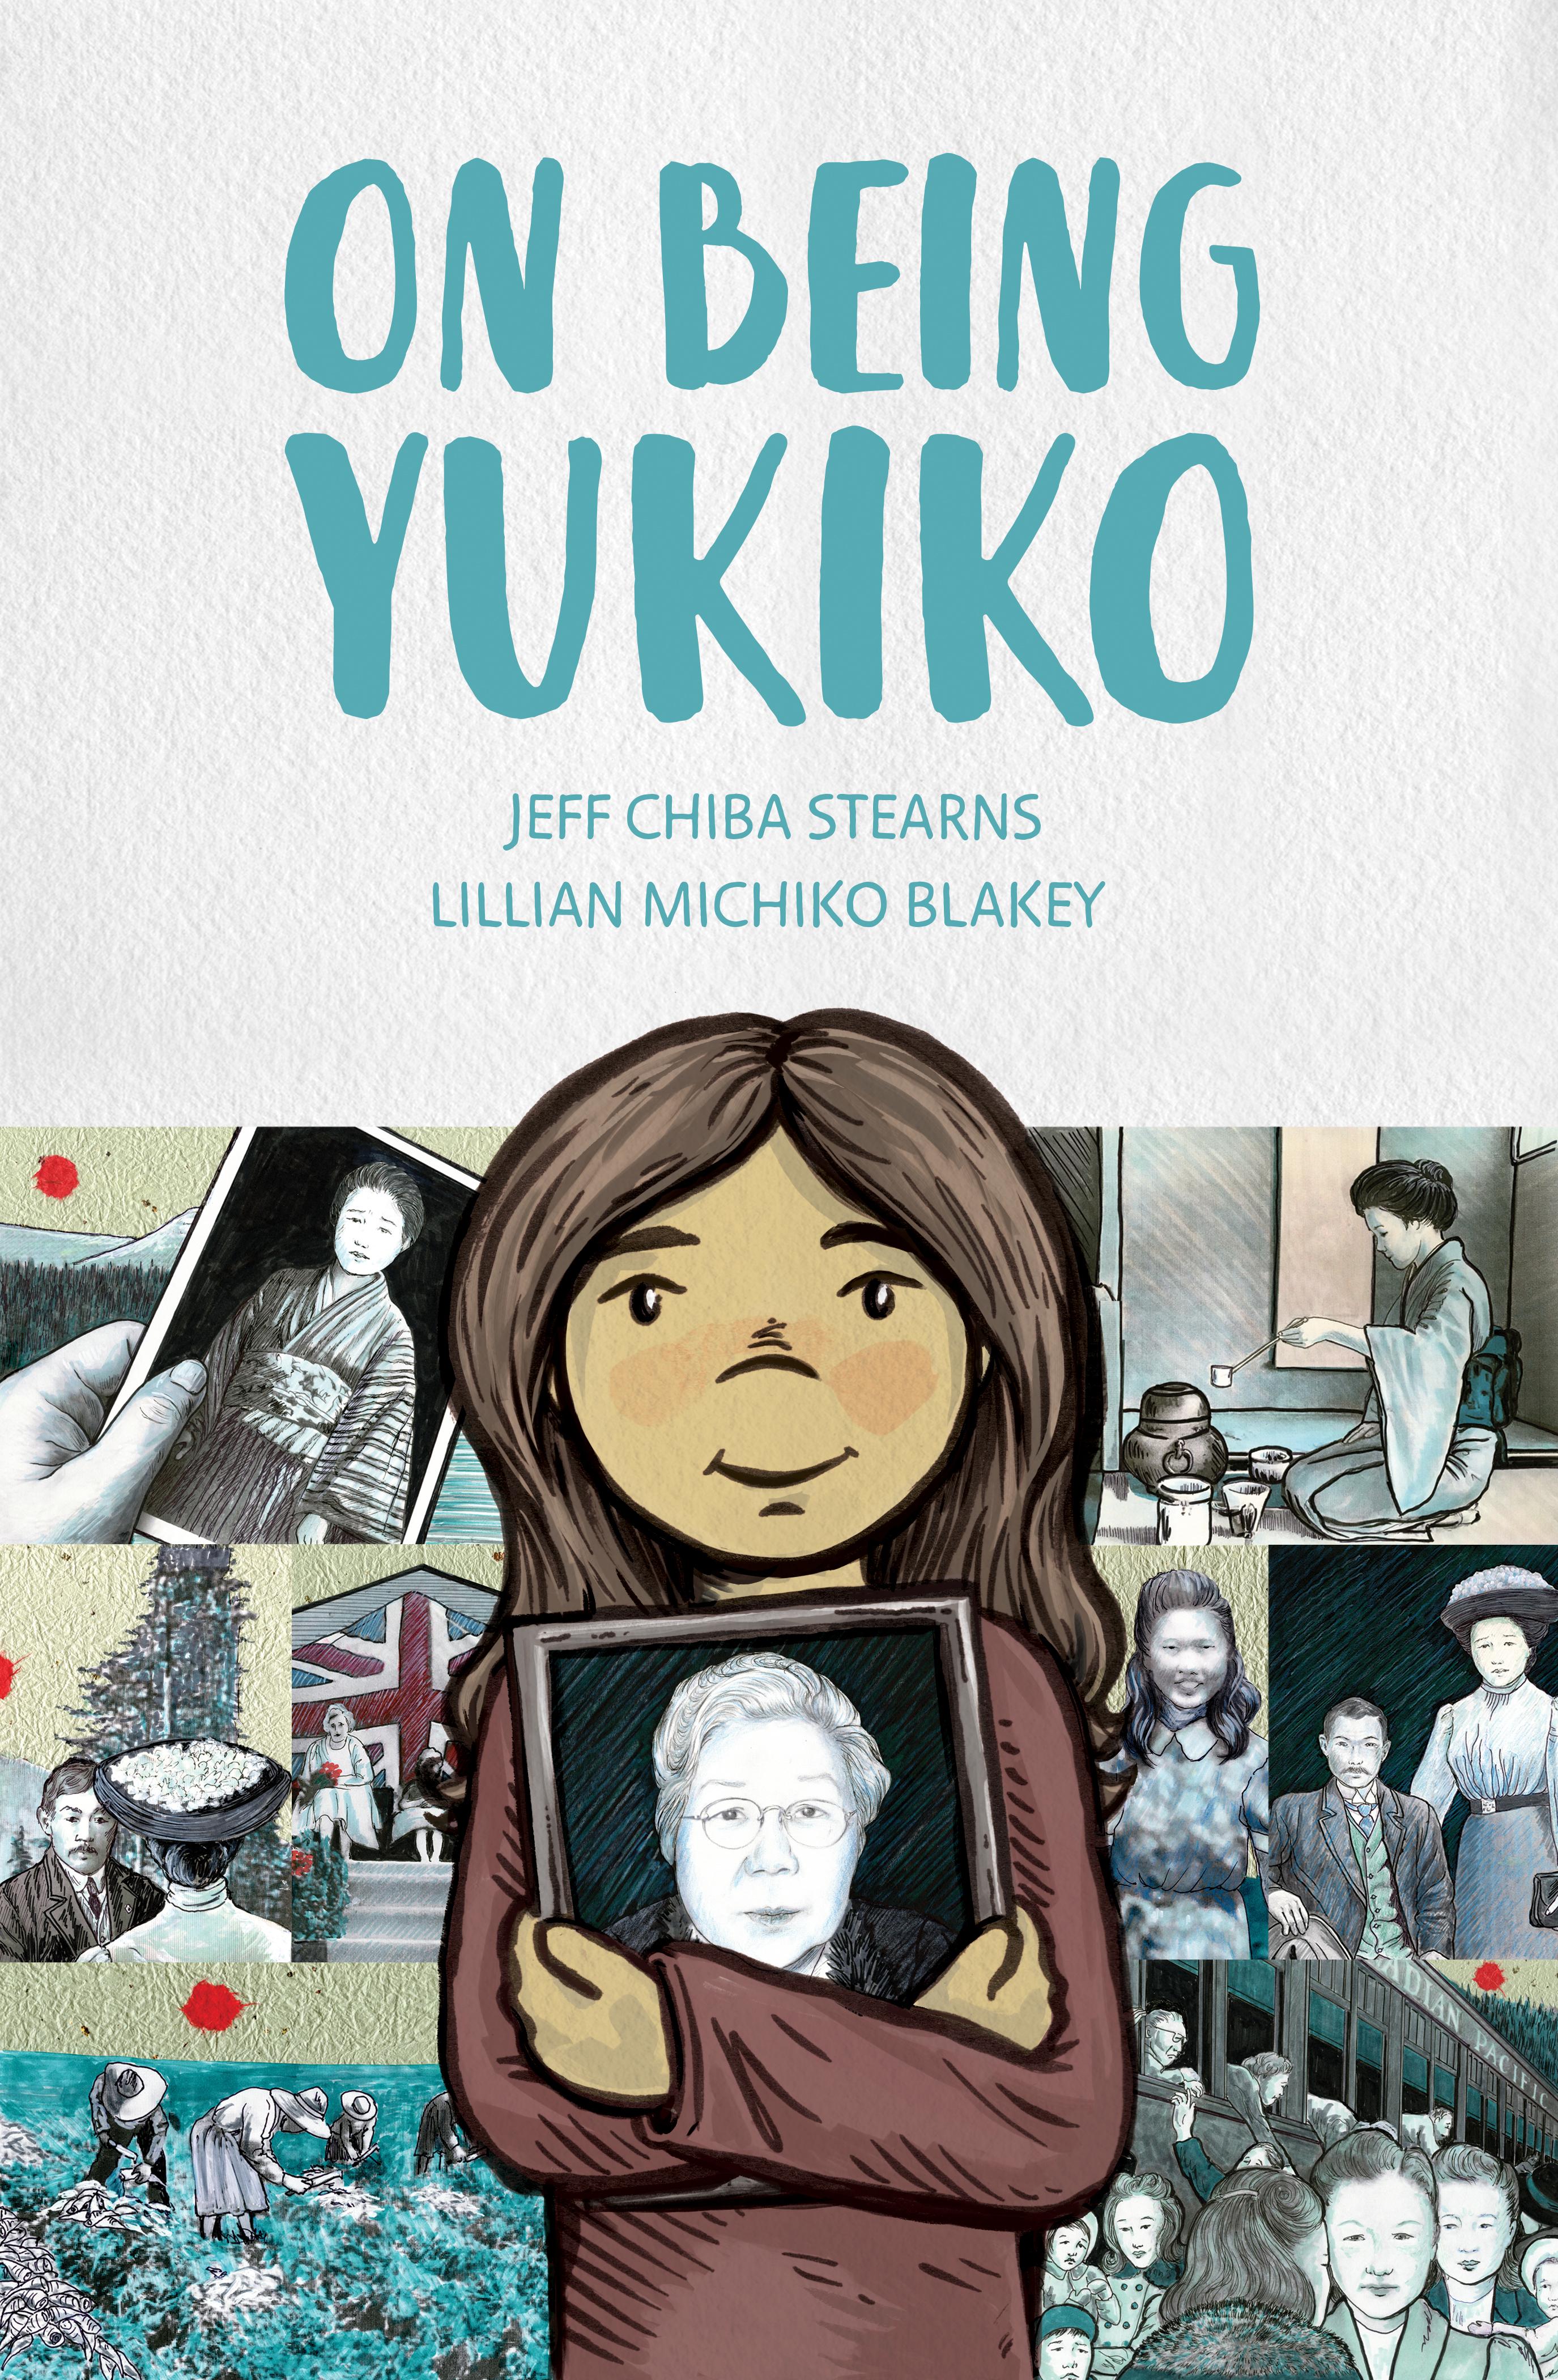 On Being Yukiko - Graphic Novel